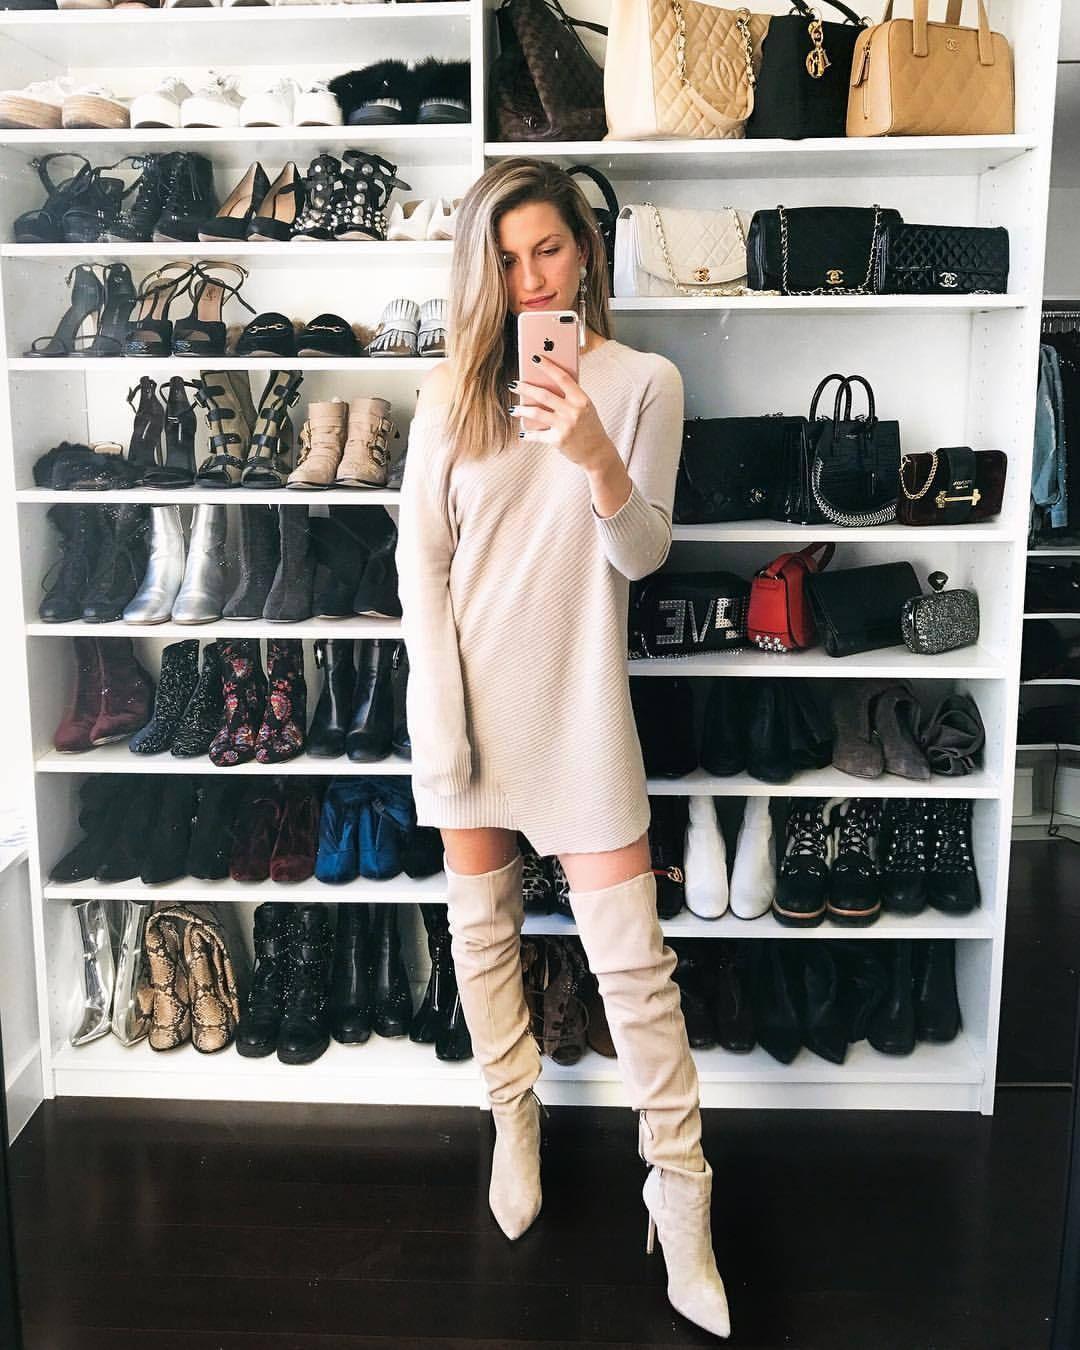 0dac137d99e Sweater Dress x OTK Boots - NYC Street Style - Closet Organization. Amateur  selfie in sweater dress and OTK boots